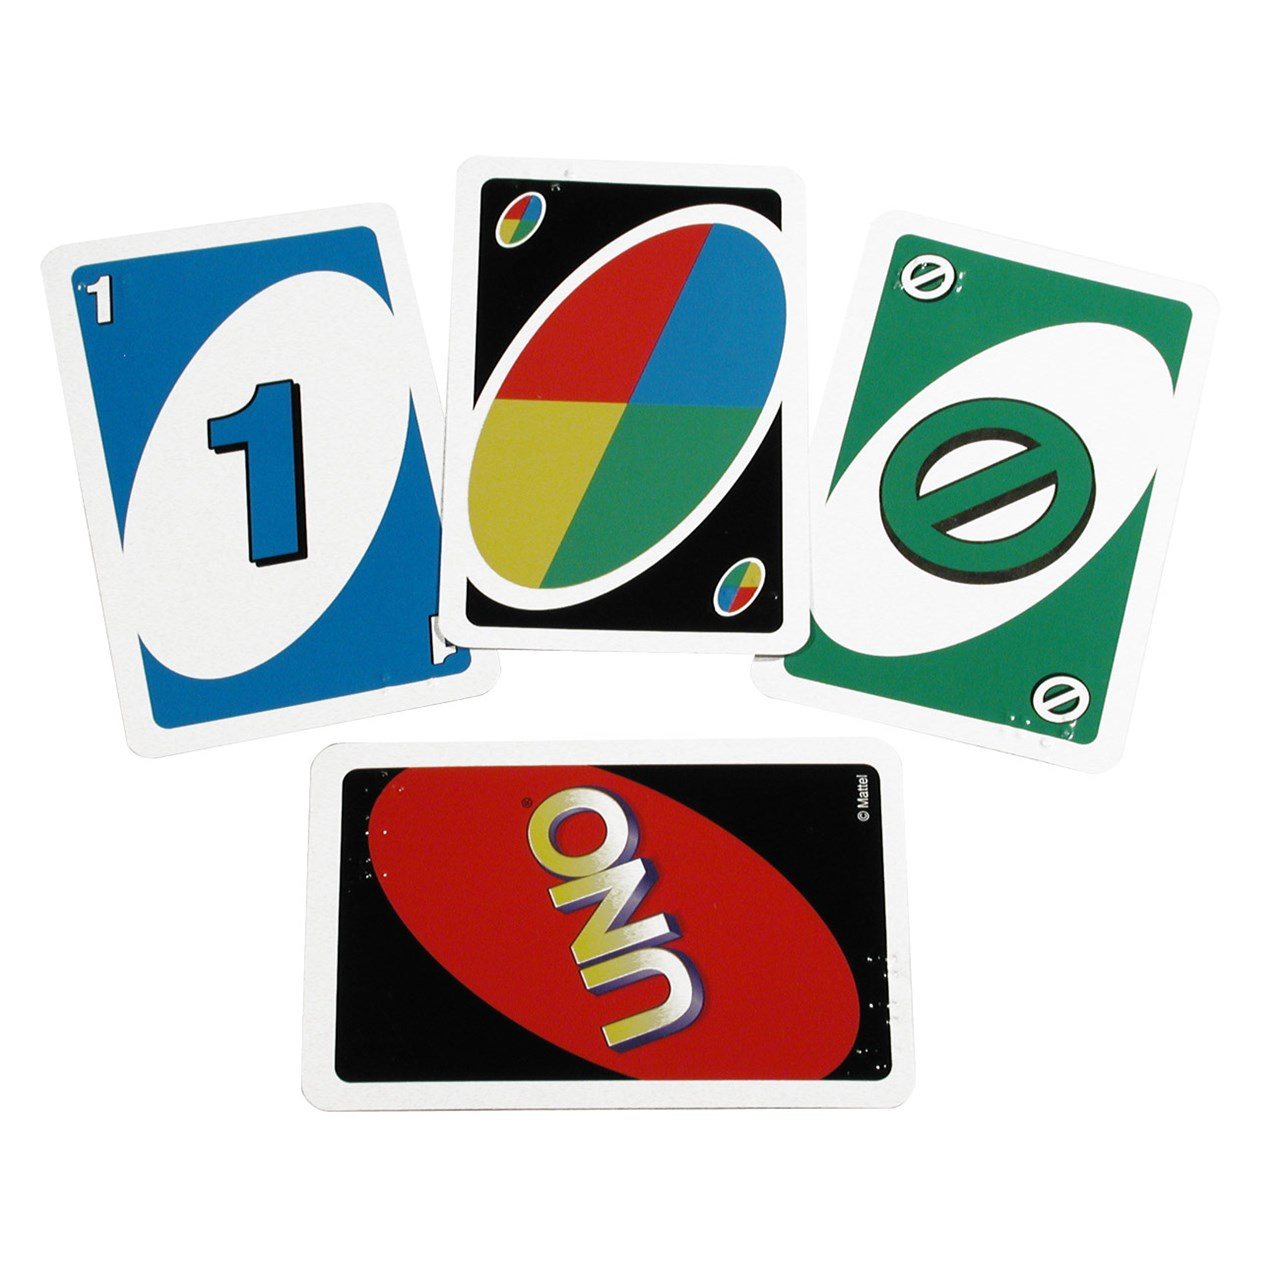 New version of Uno